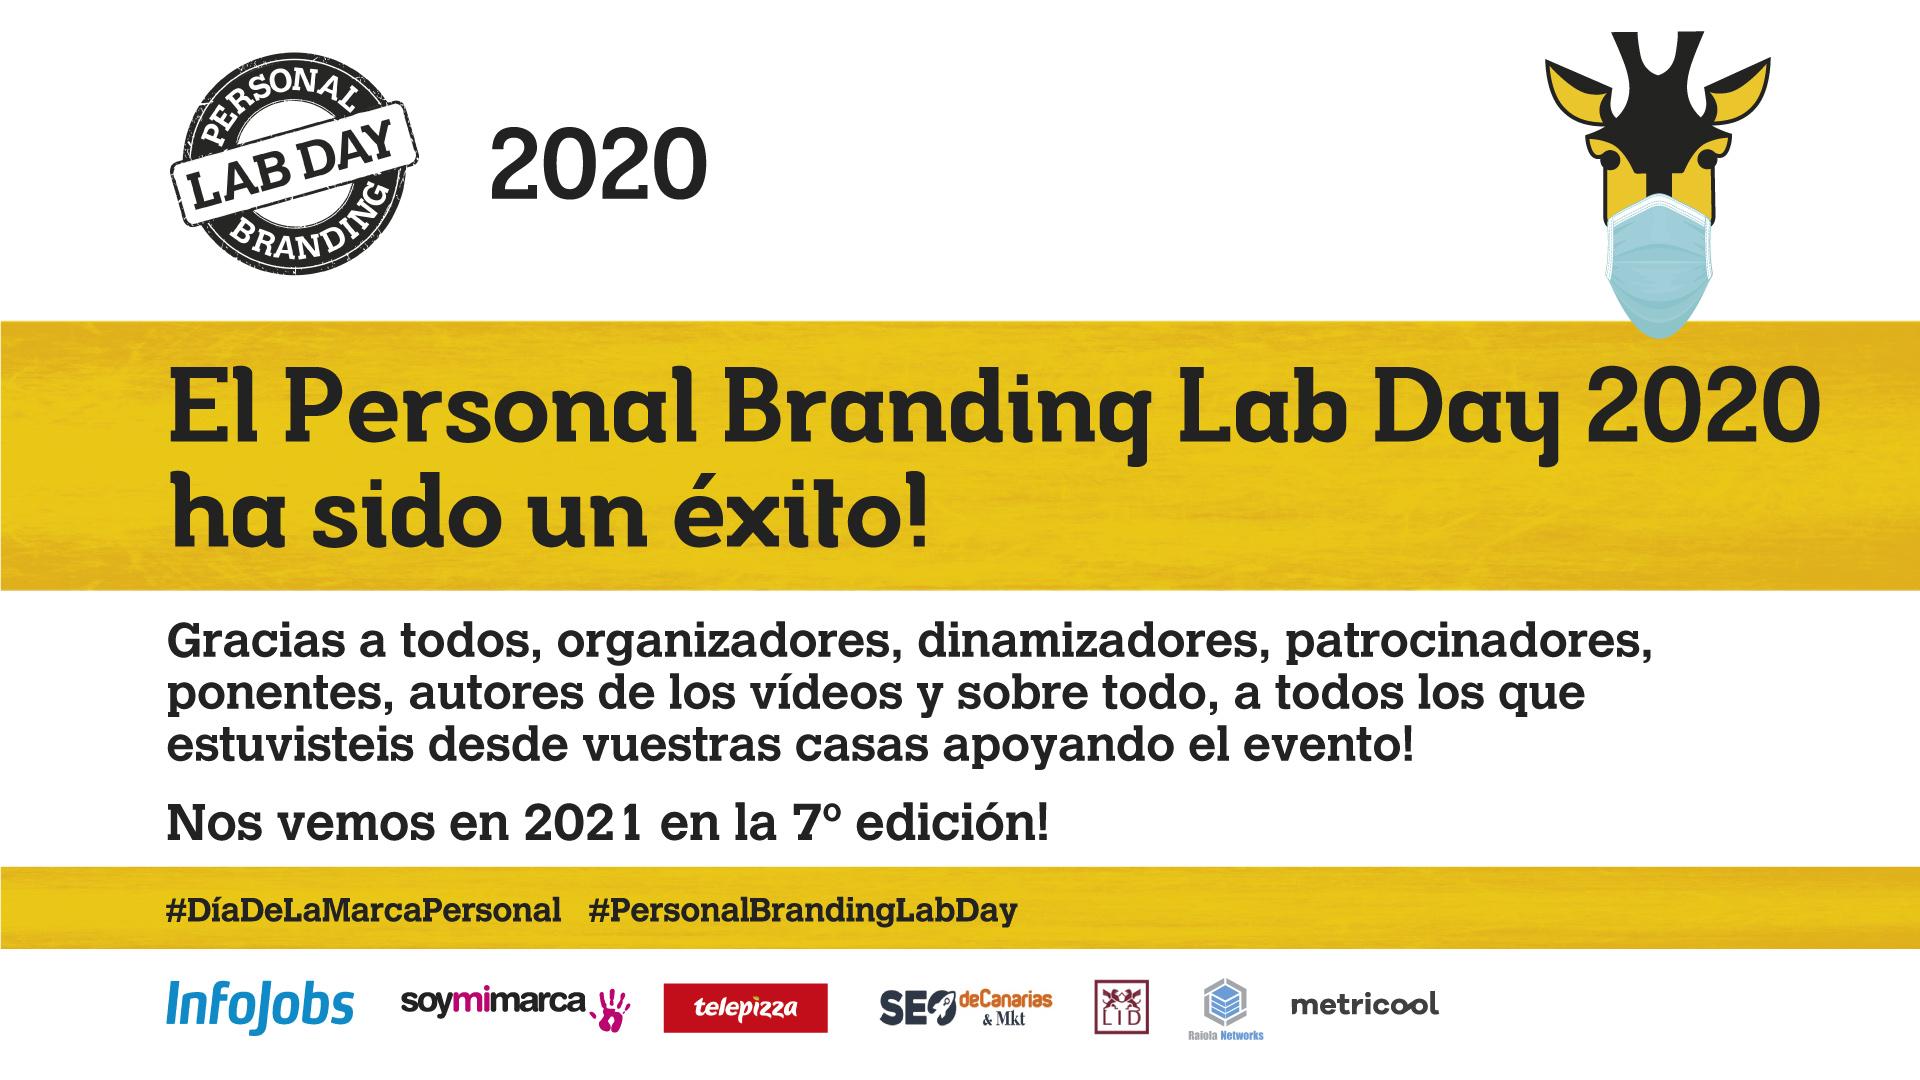 Personal Branding Lab Day 2020